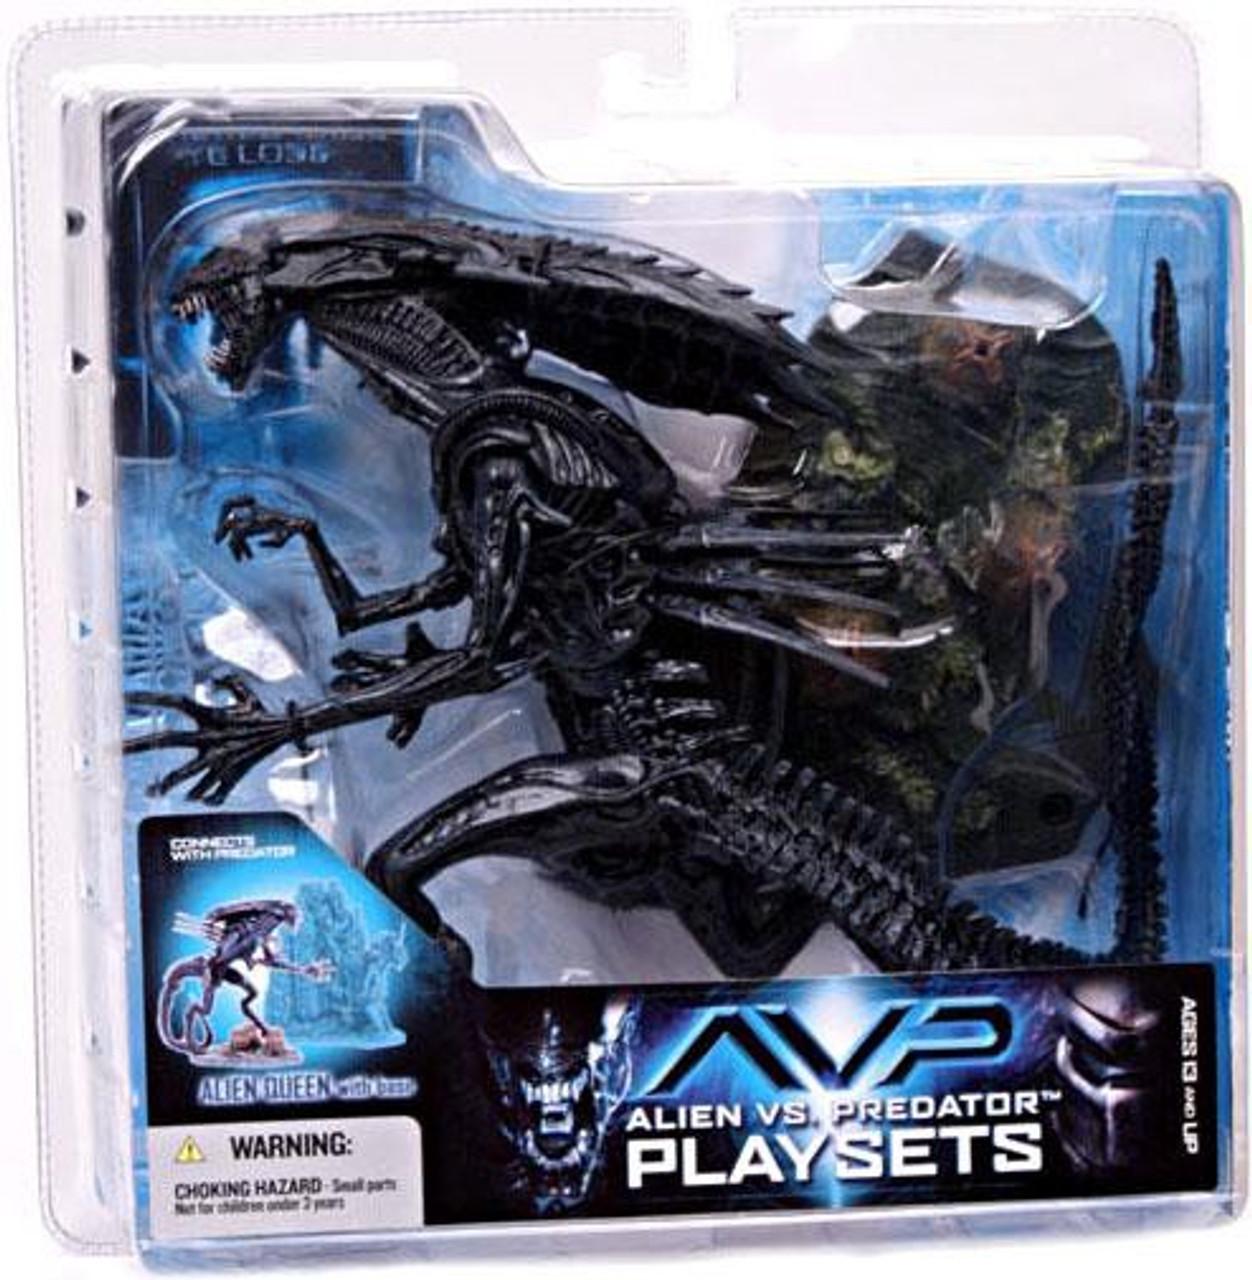 McFarlane Toys Alien vs Predator Alien vs  Predator Movie Playsets